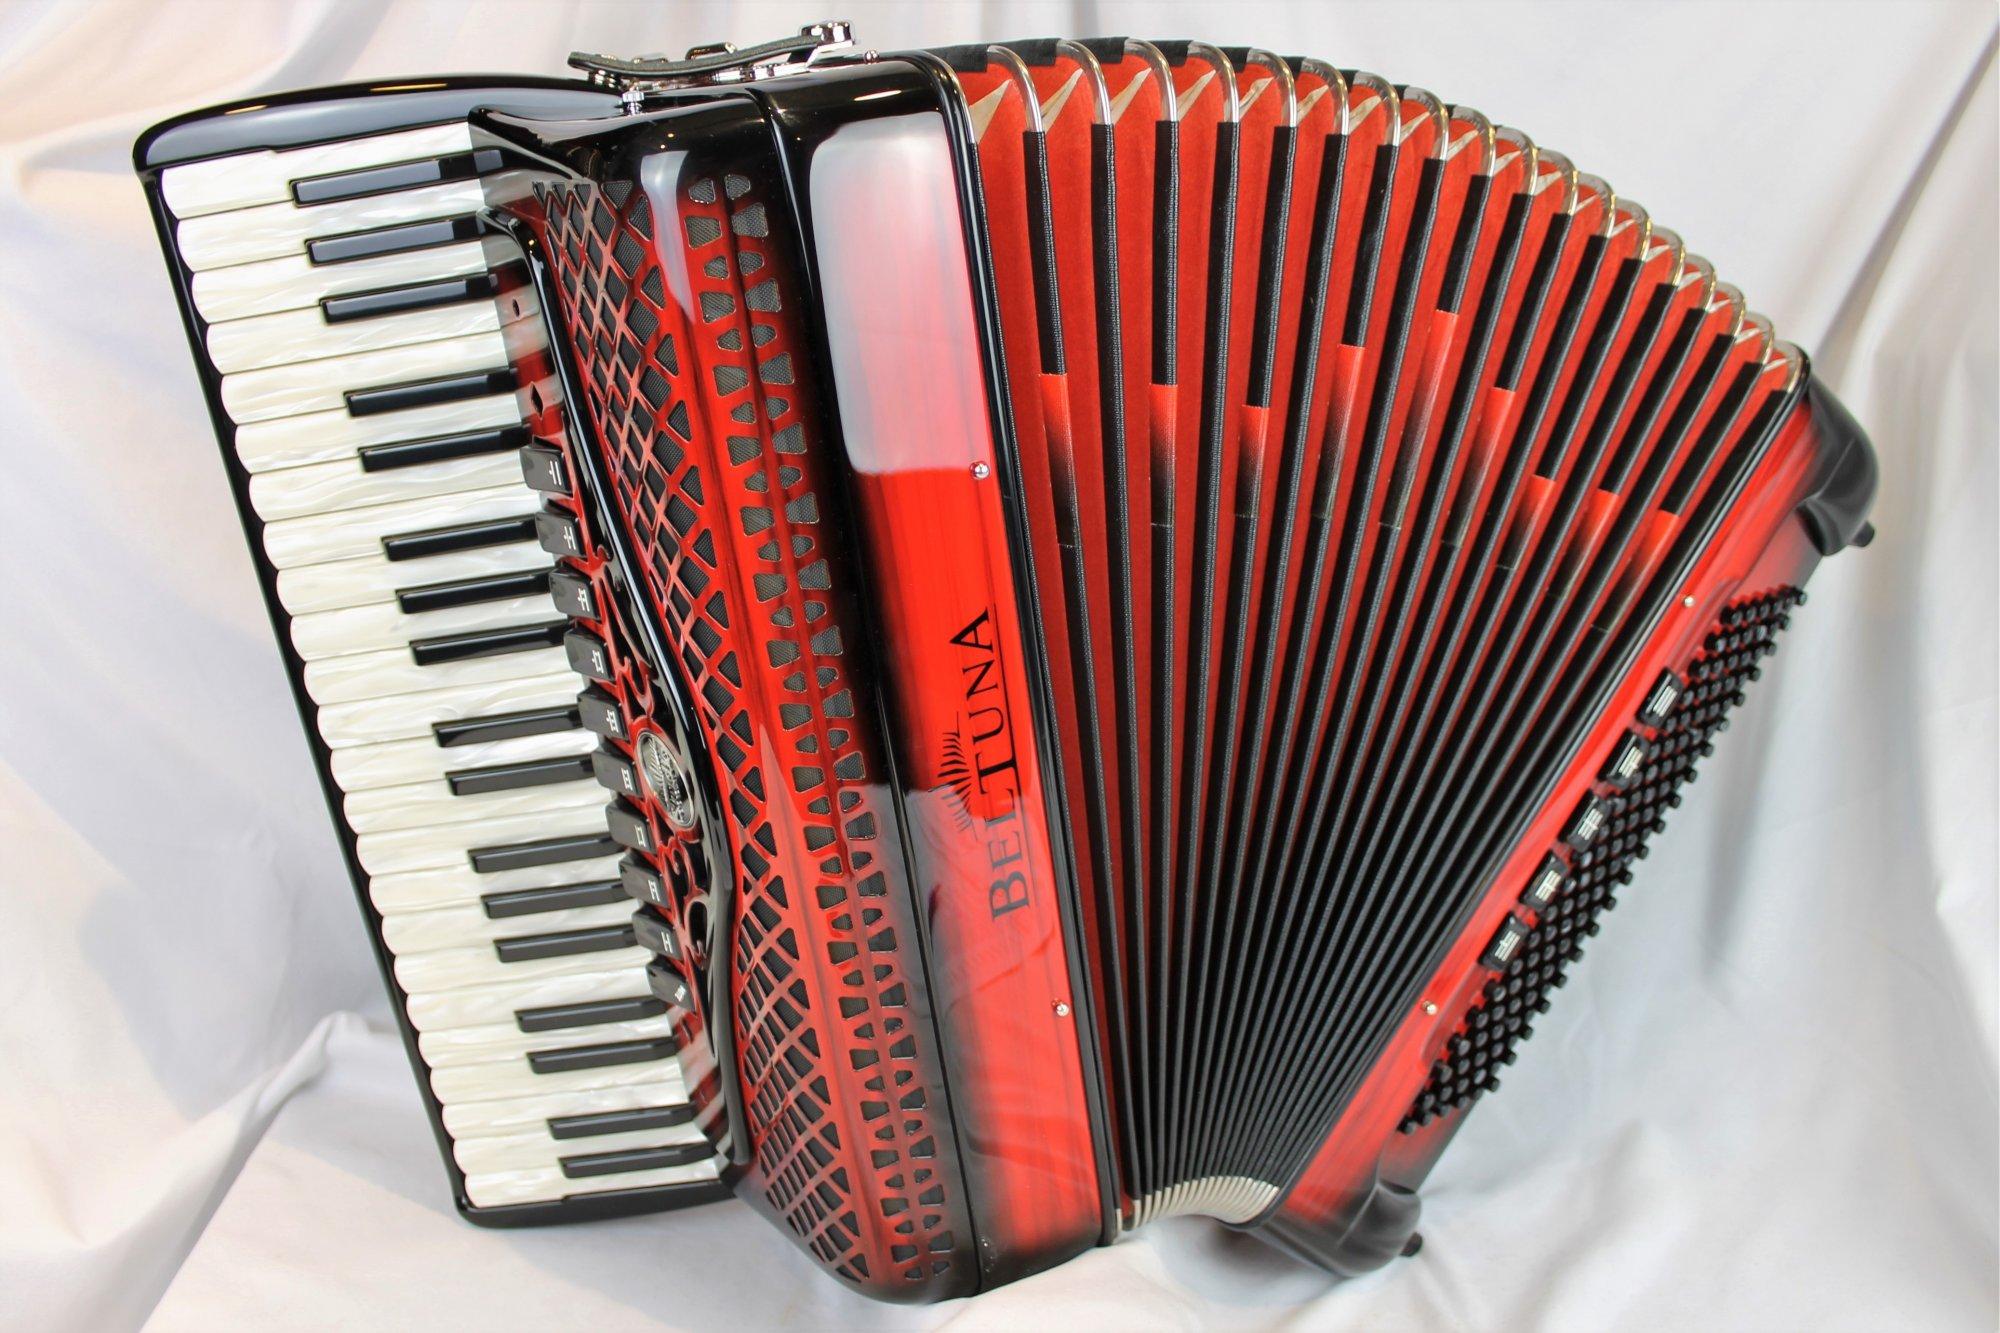 NEW Red Shadow Beltuna Studio IV Piano Accordion LMMM 41 120